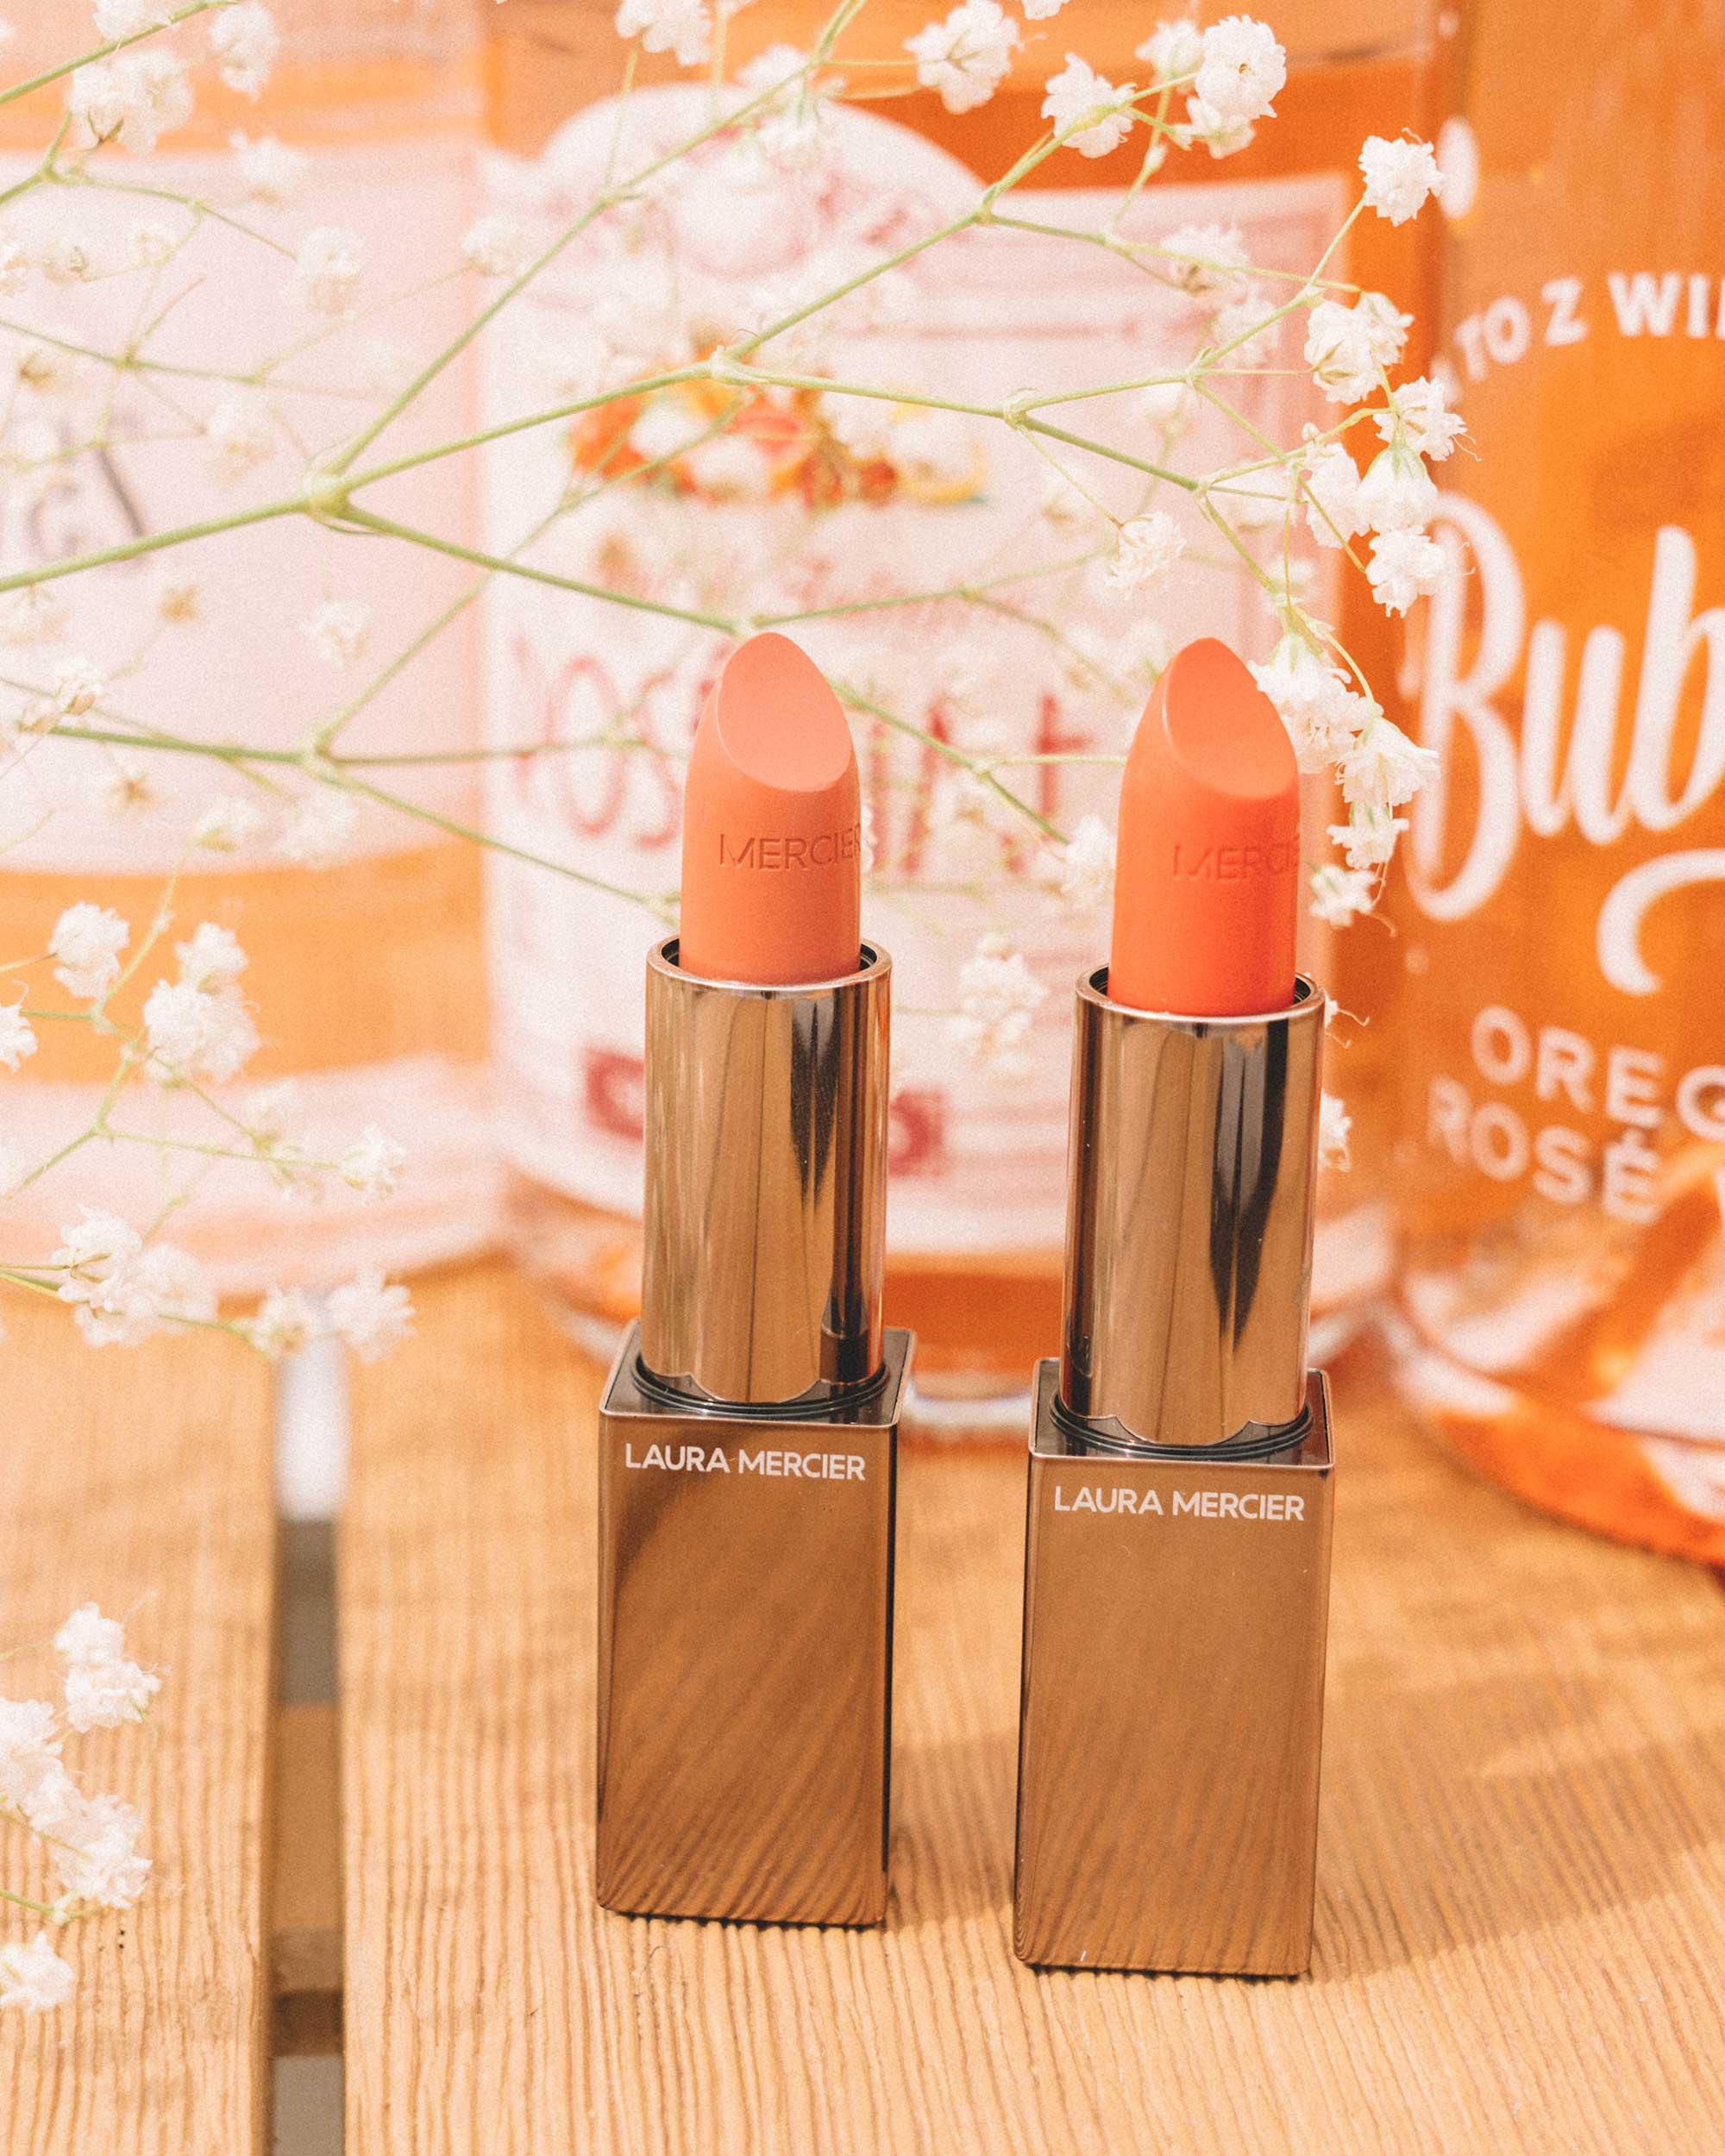 Laura-Mercier-Rouge-Essential-Silky-Creme-Lipstick3.jpg